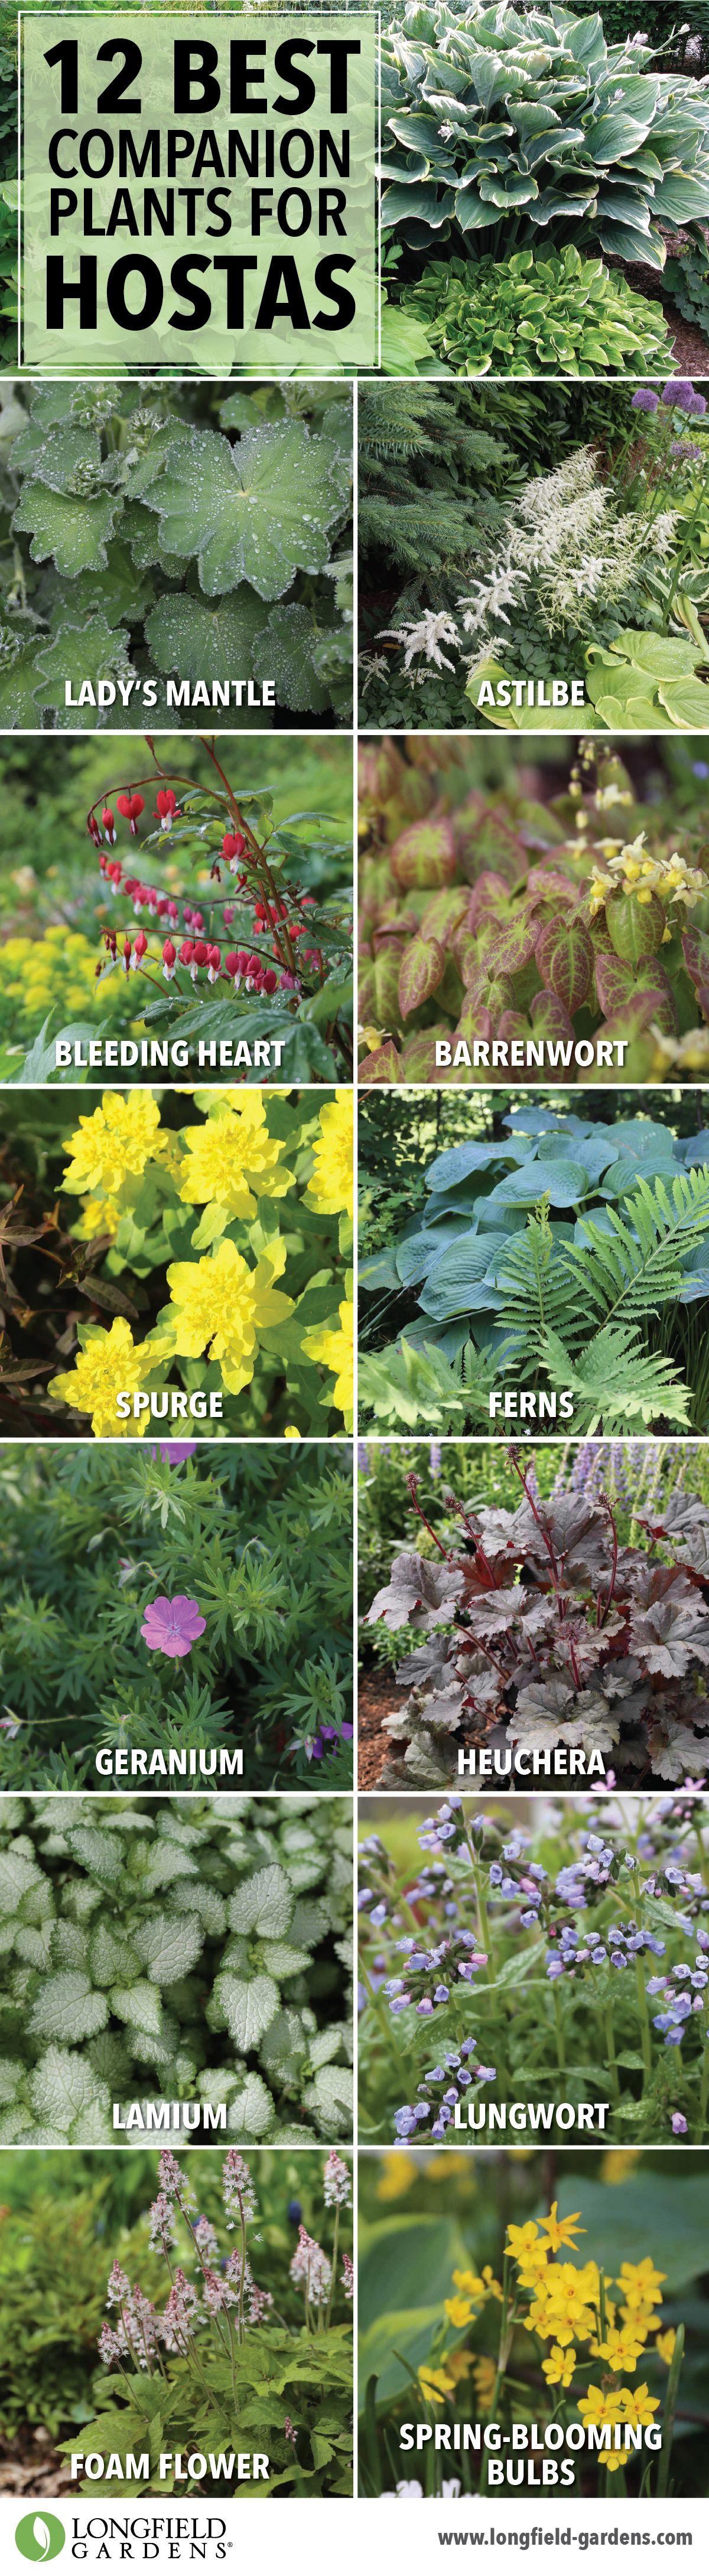 12 Best Companion Plants For Hostas Garden Flowers Shade